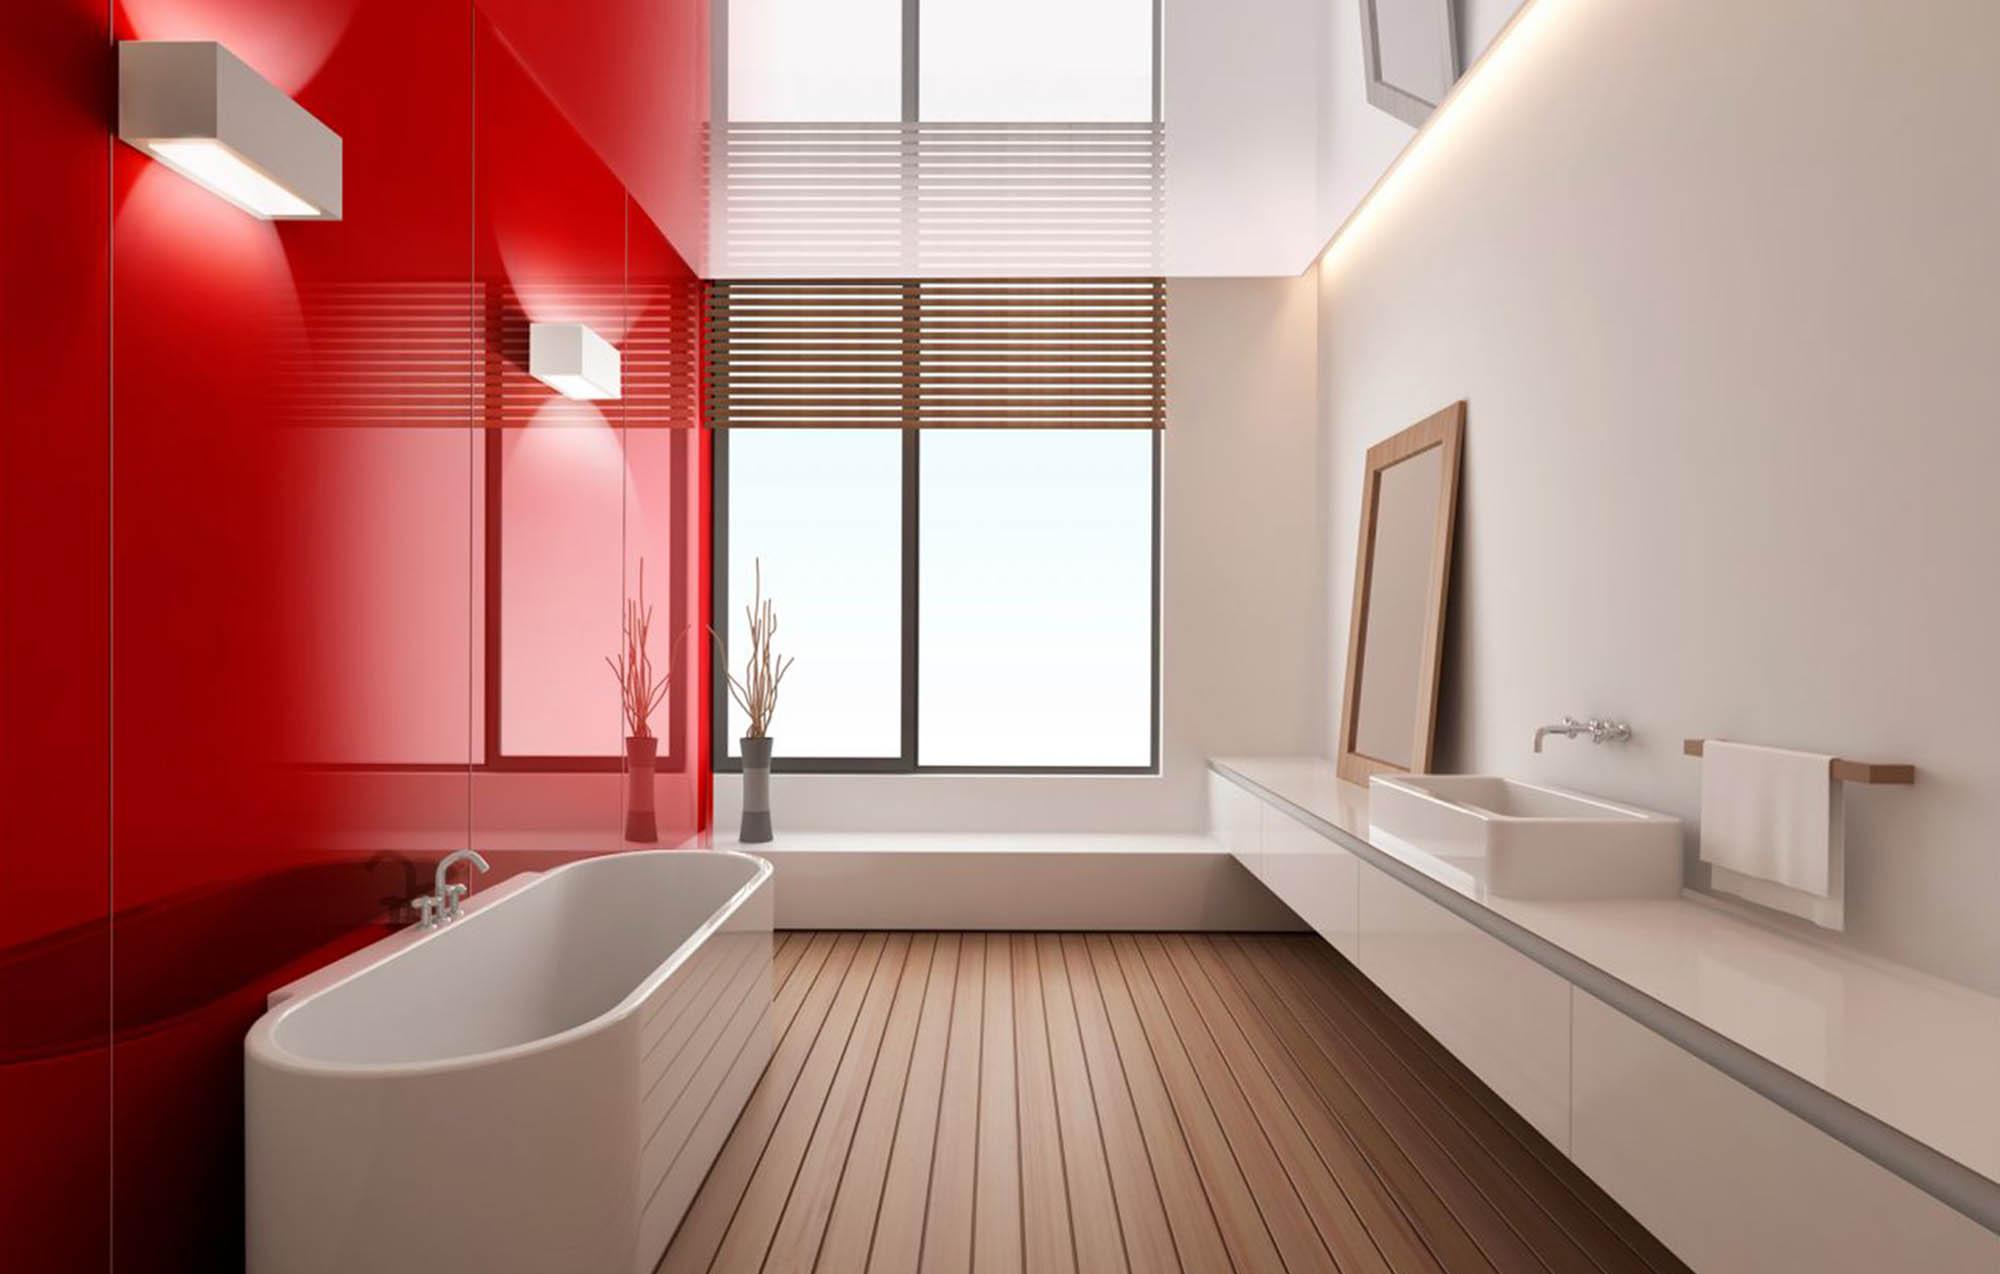 4 ideas originales para revestir las paredes de tu hogar